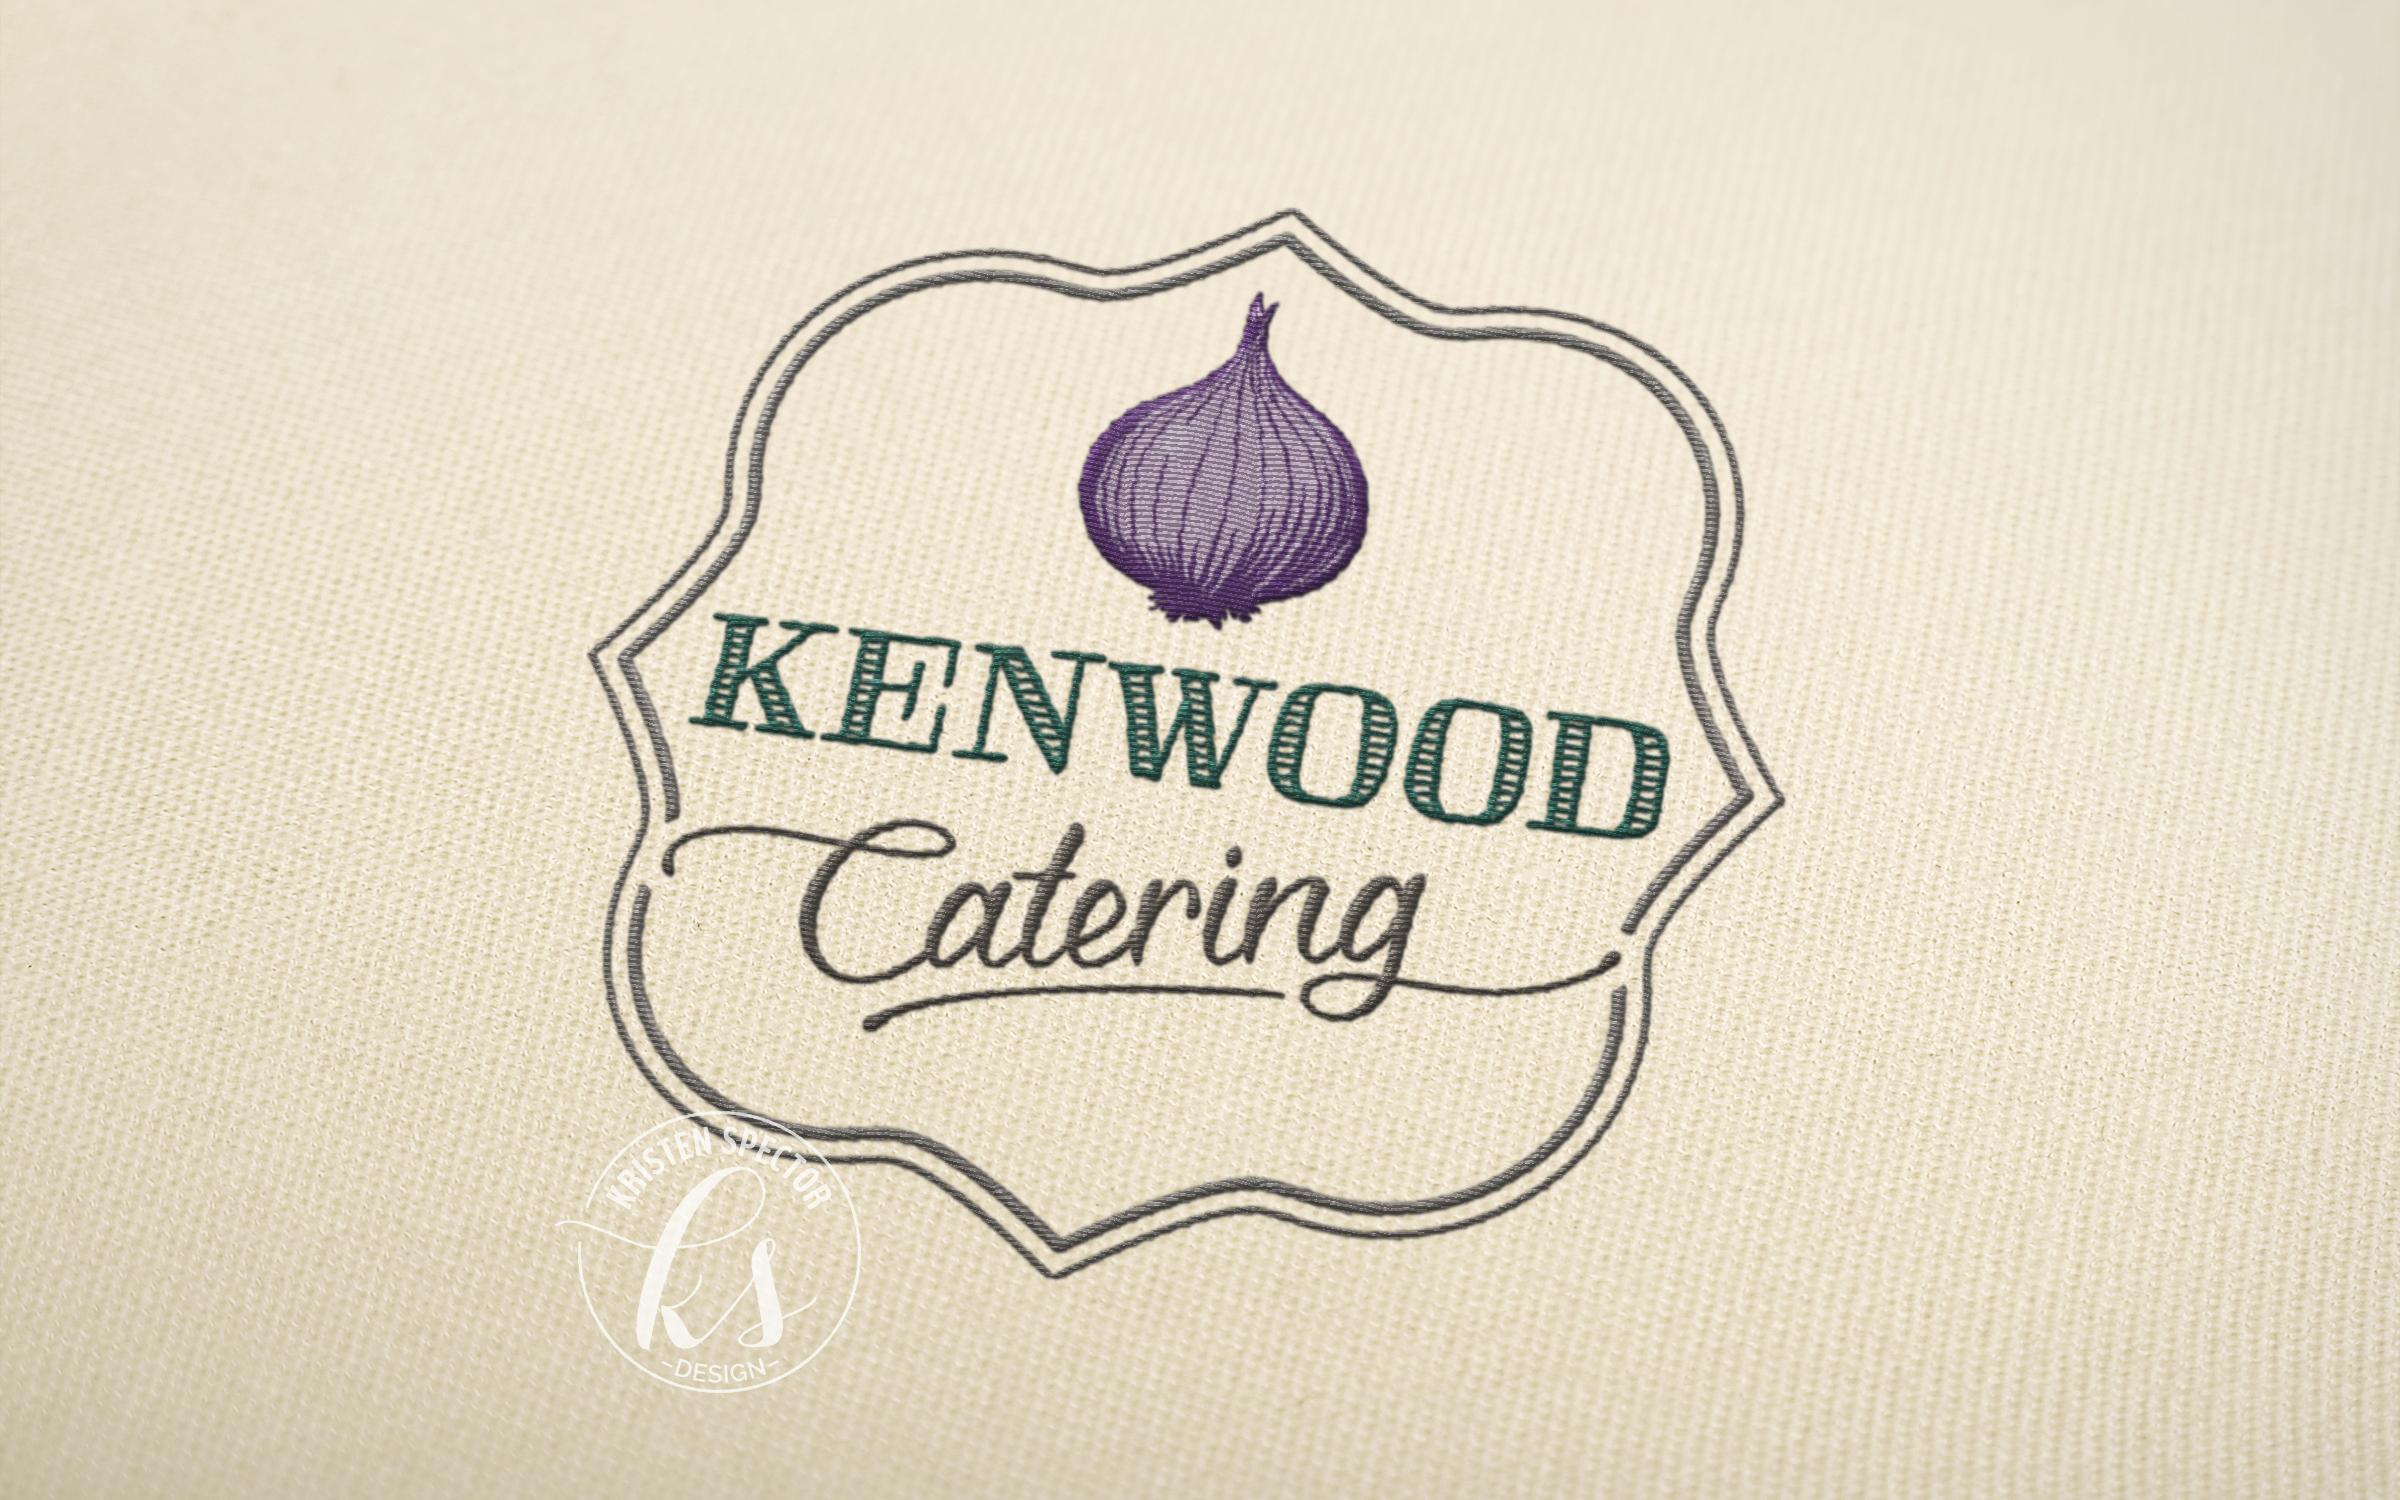 Kenwood Catering, LLC